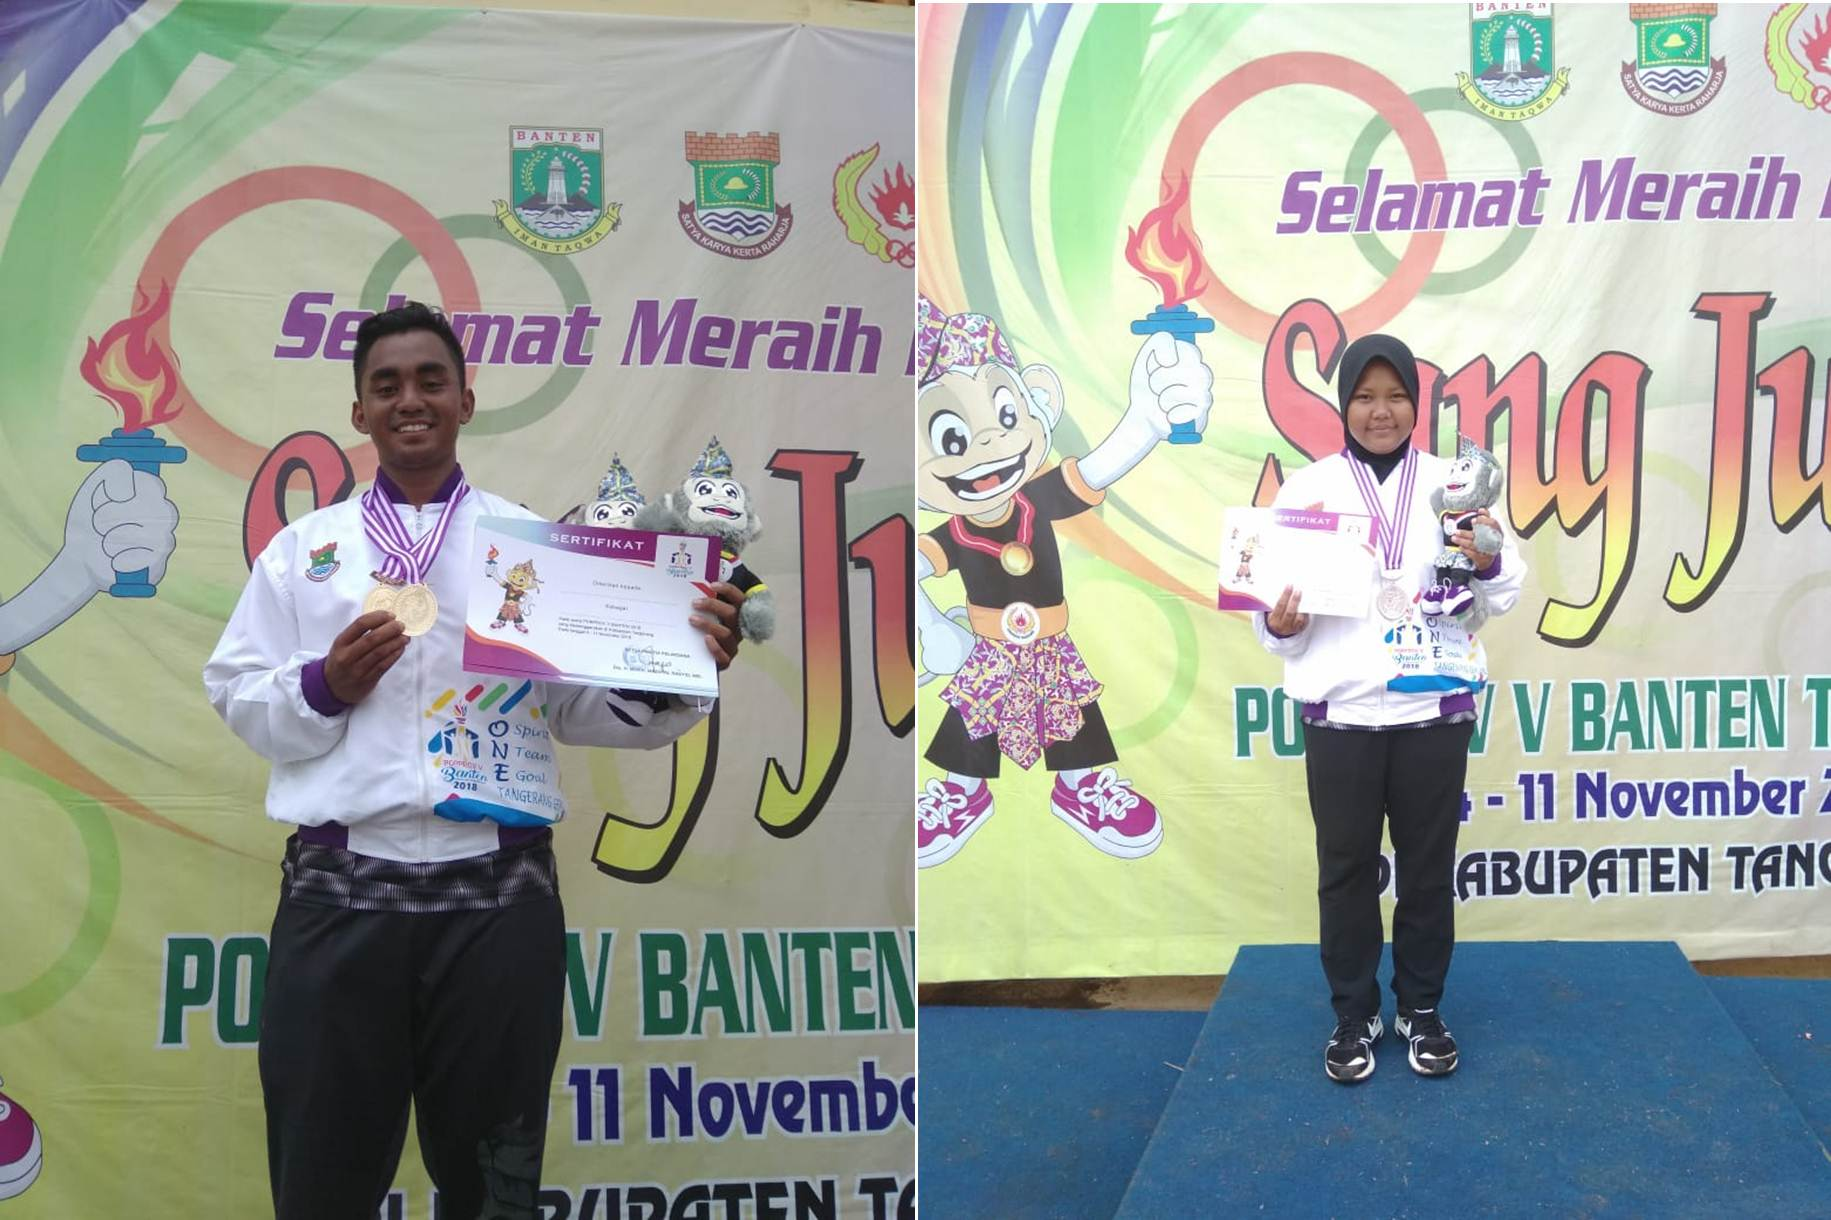 Reza (Kiri) Aprilia (Kanan) Saat Mendapatkan Piagam dan Medali di Kejuaraan Porpov Banten